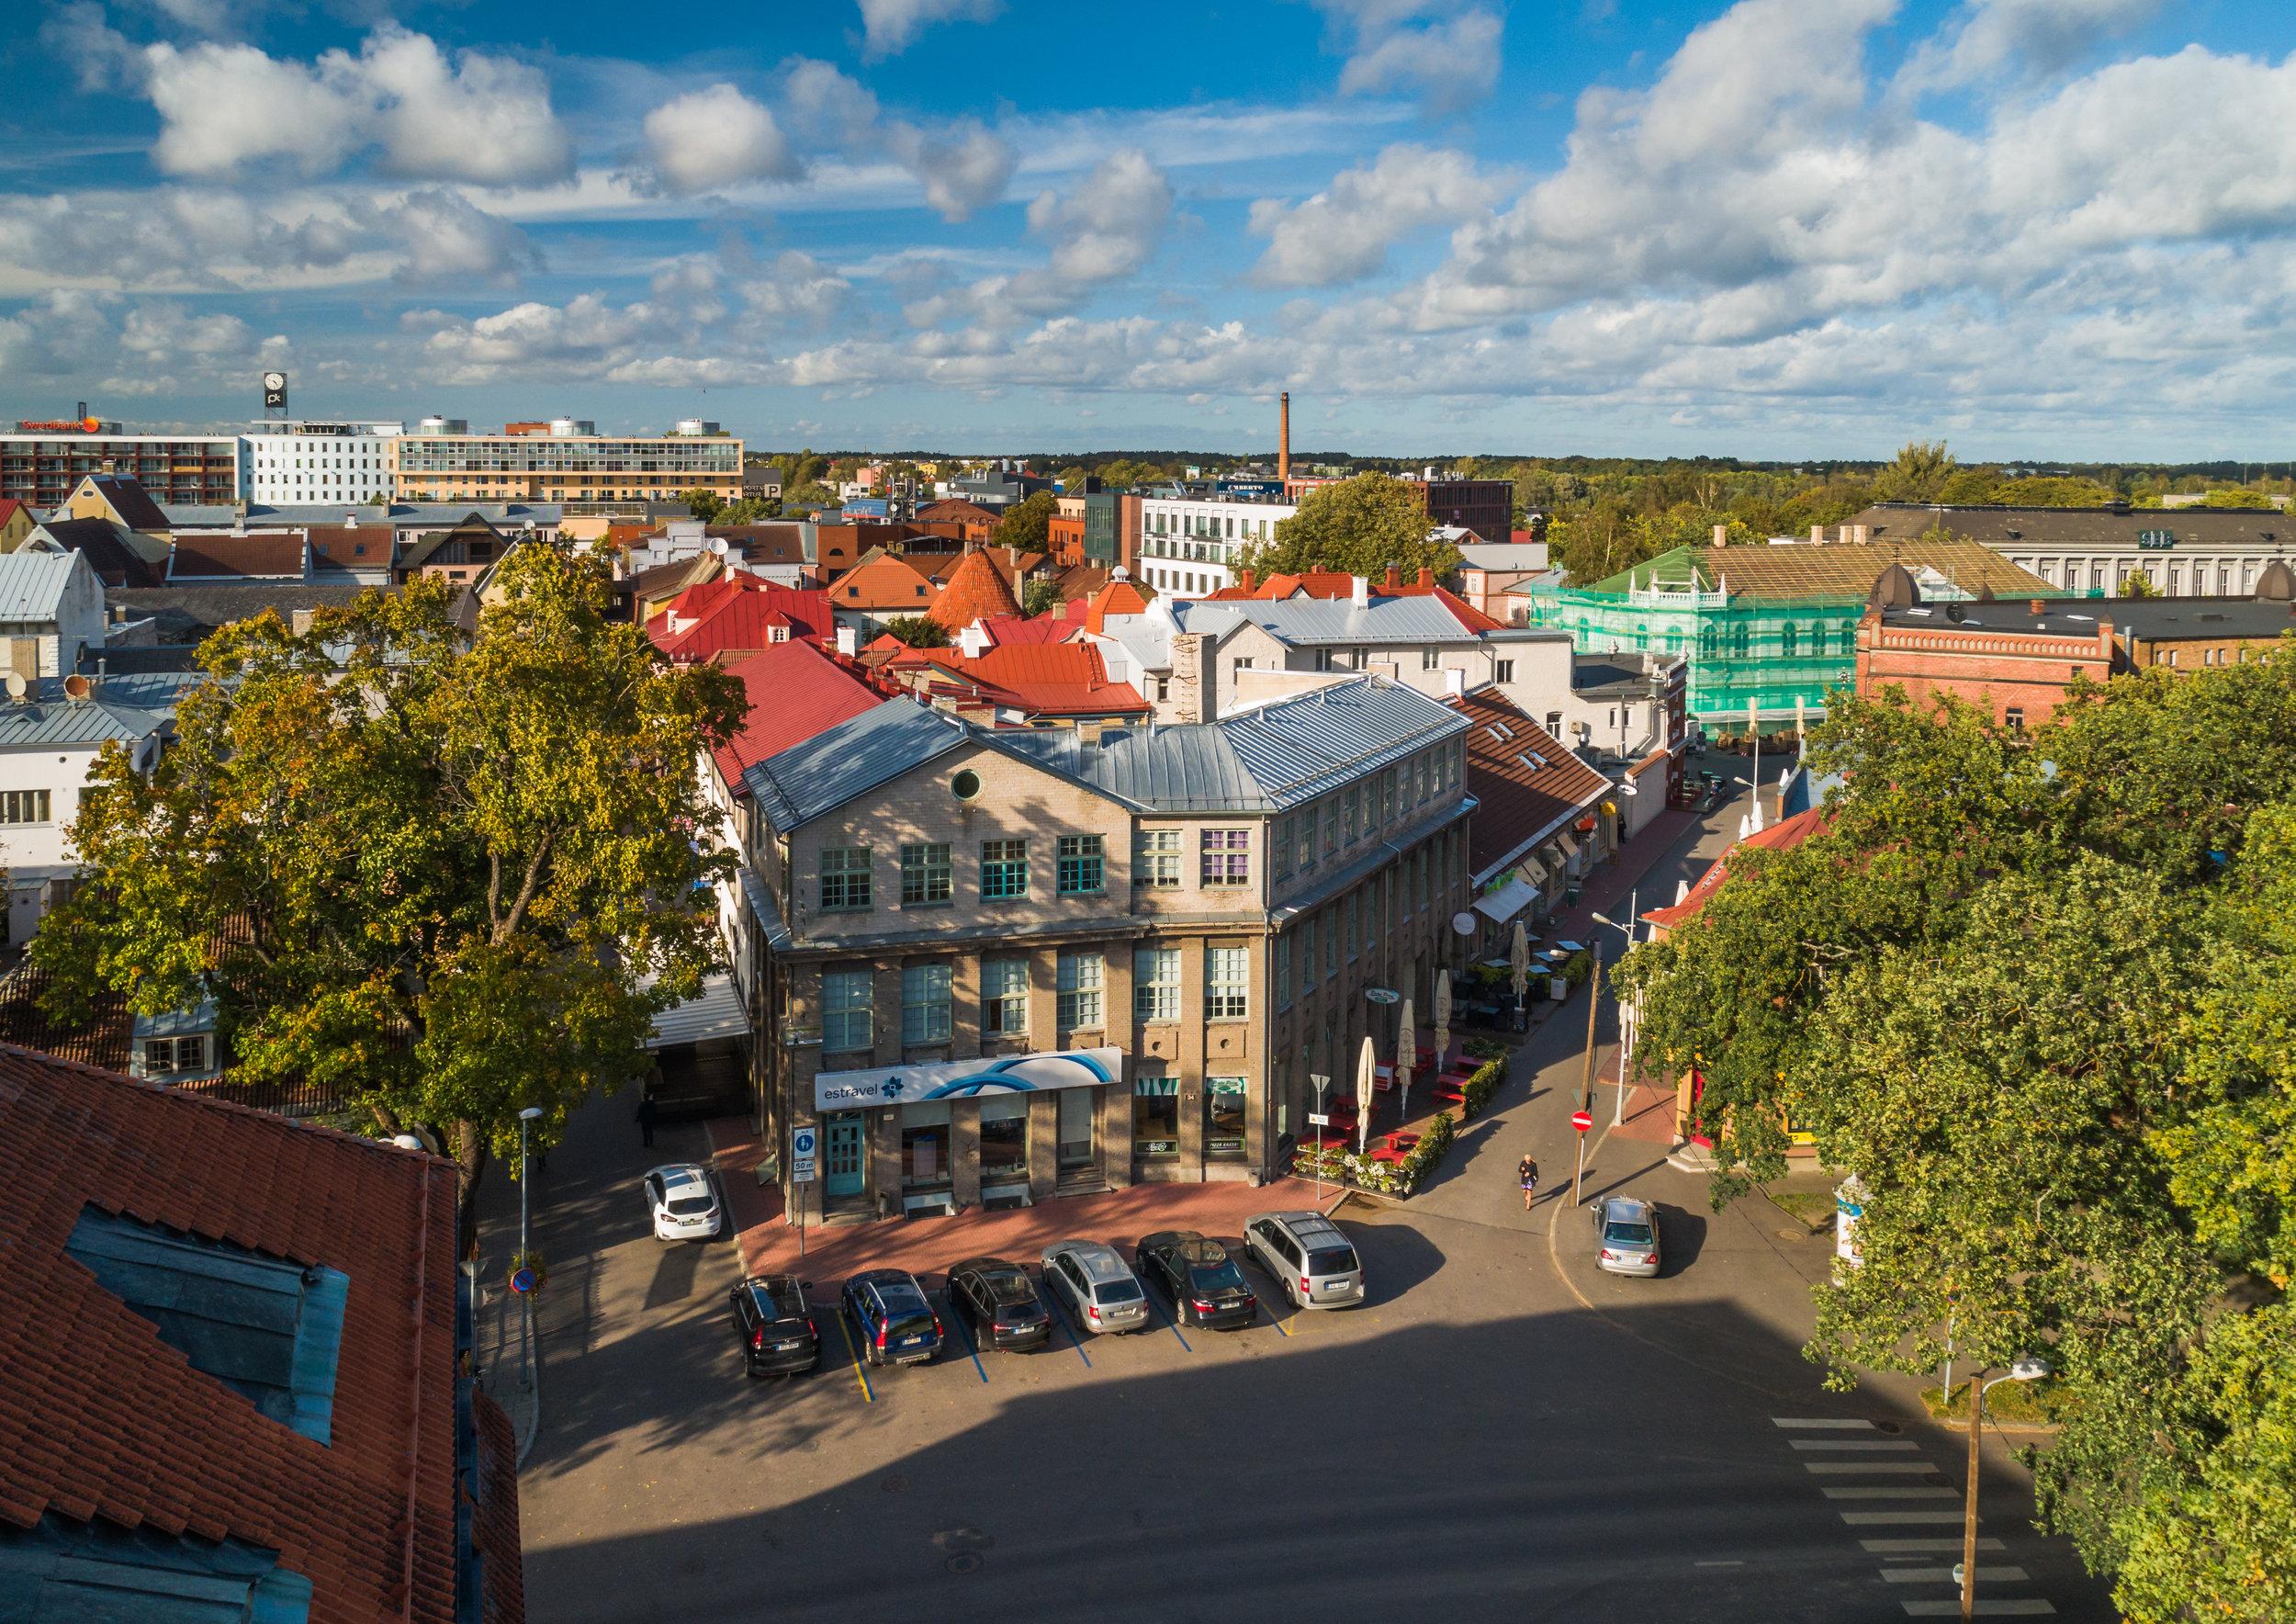 Estravel-Pärnu-Droon (7 of 11).jpg